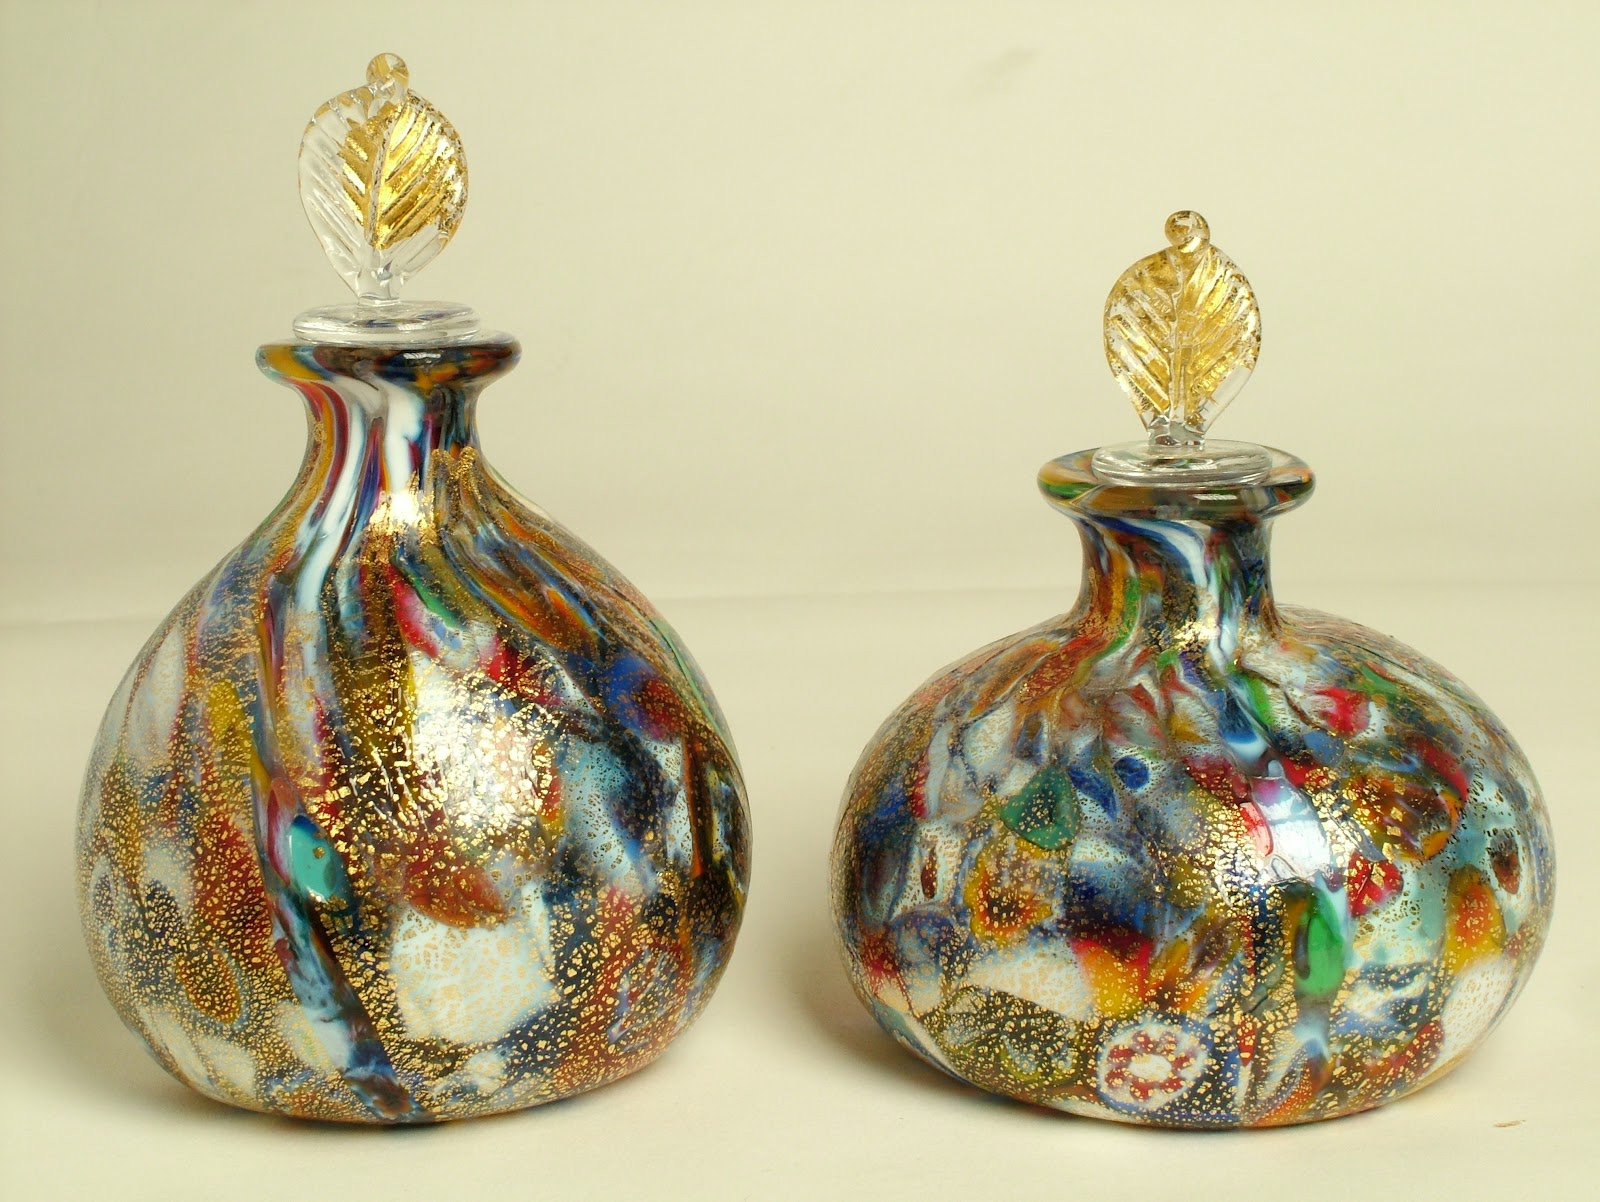 Devignidesigns murano glass perfume bottles